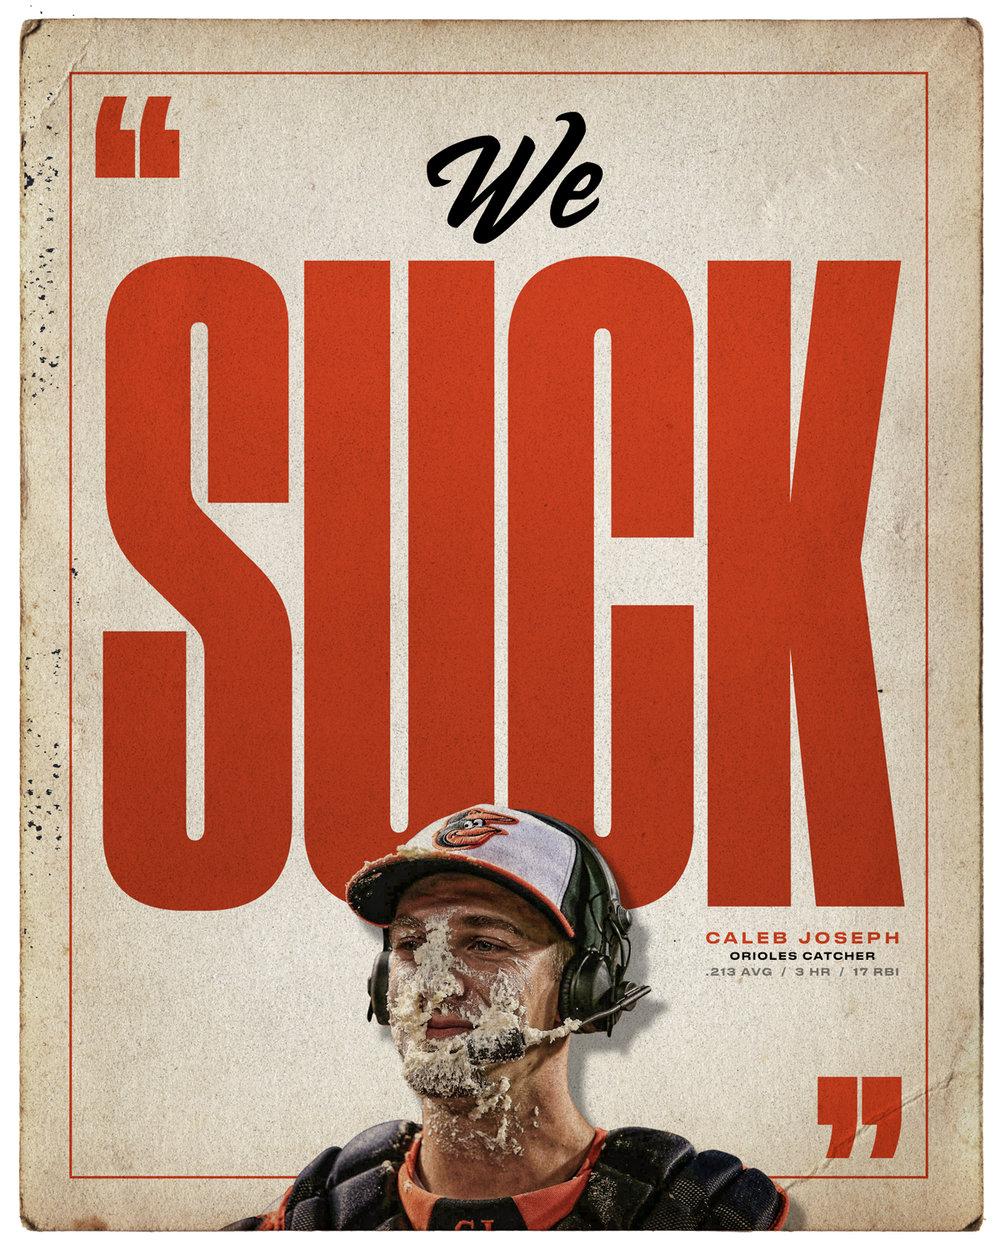 Orioles_9-18-18_WeSuck.jpg